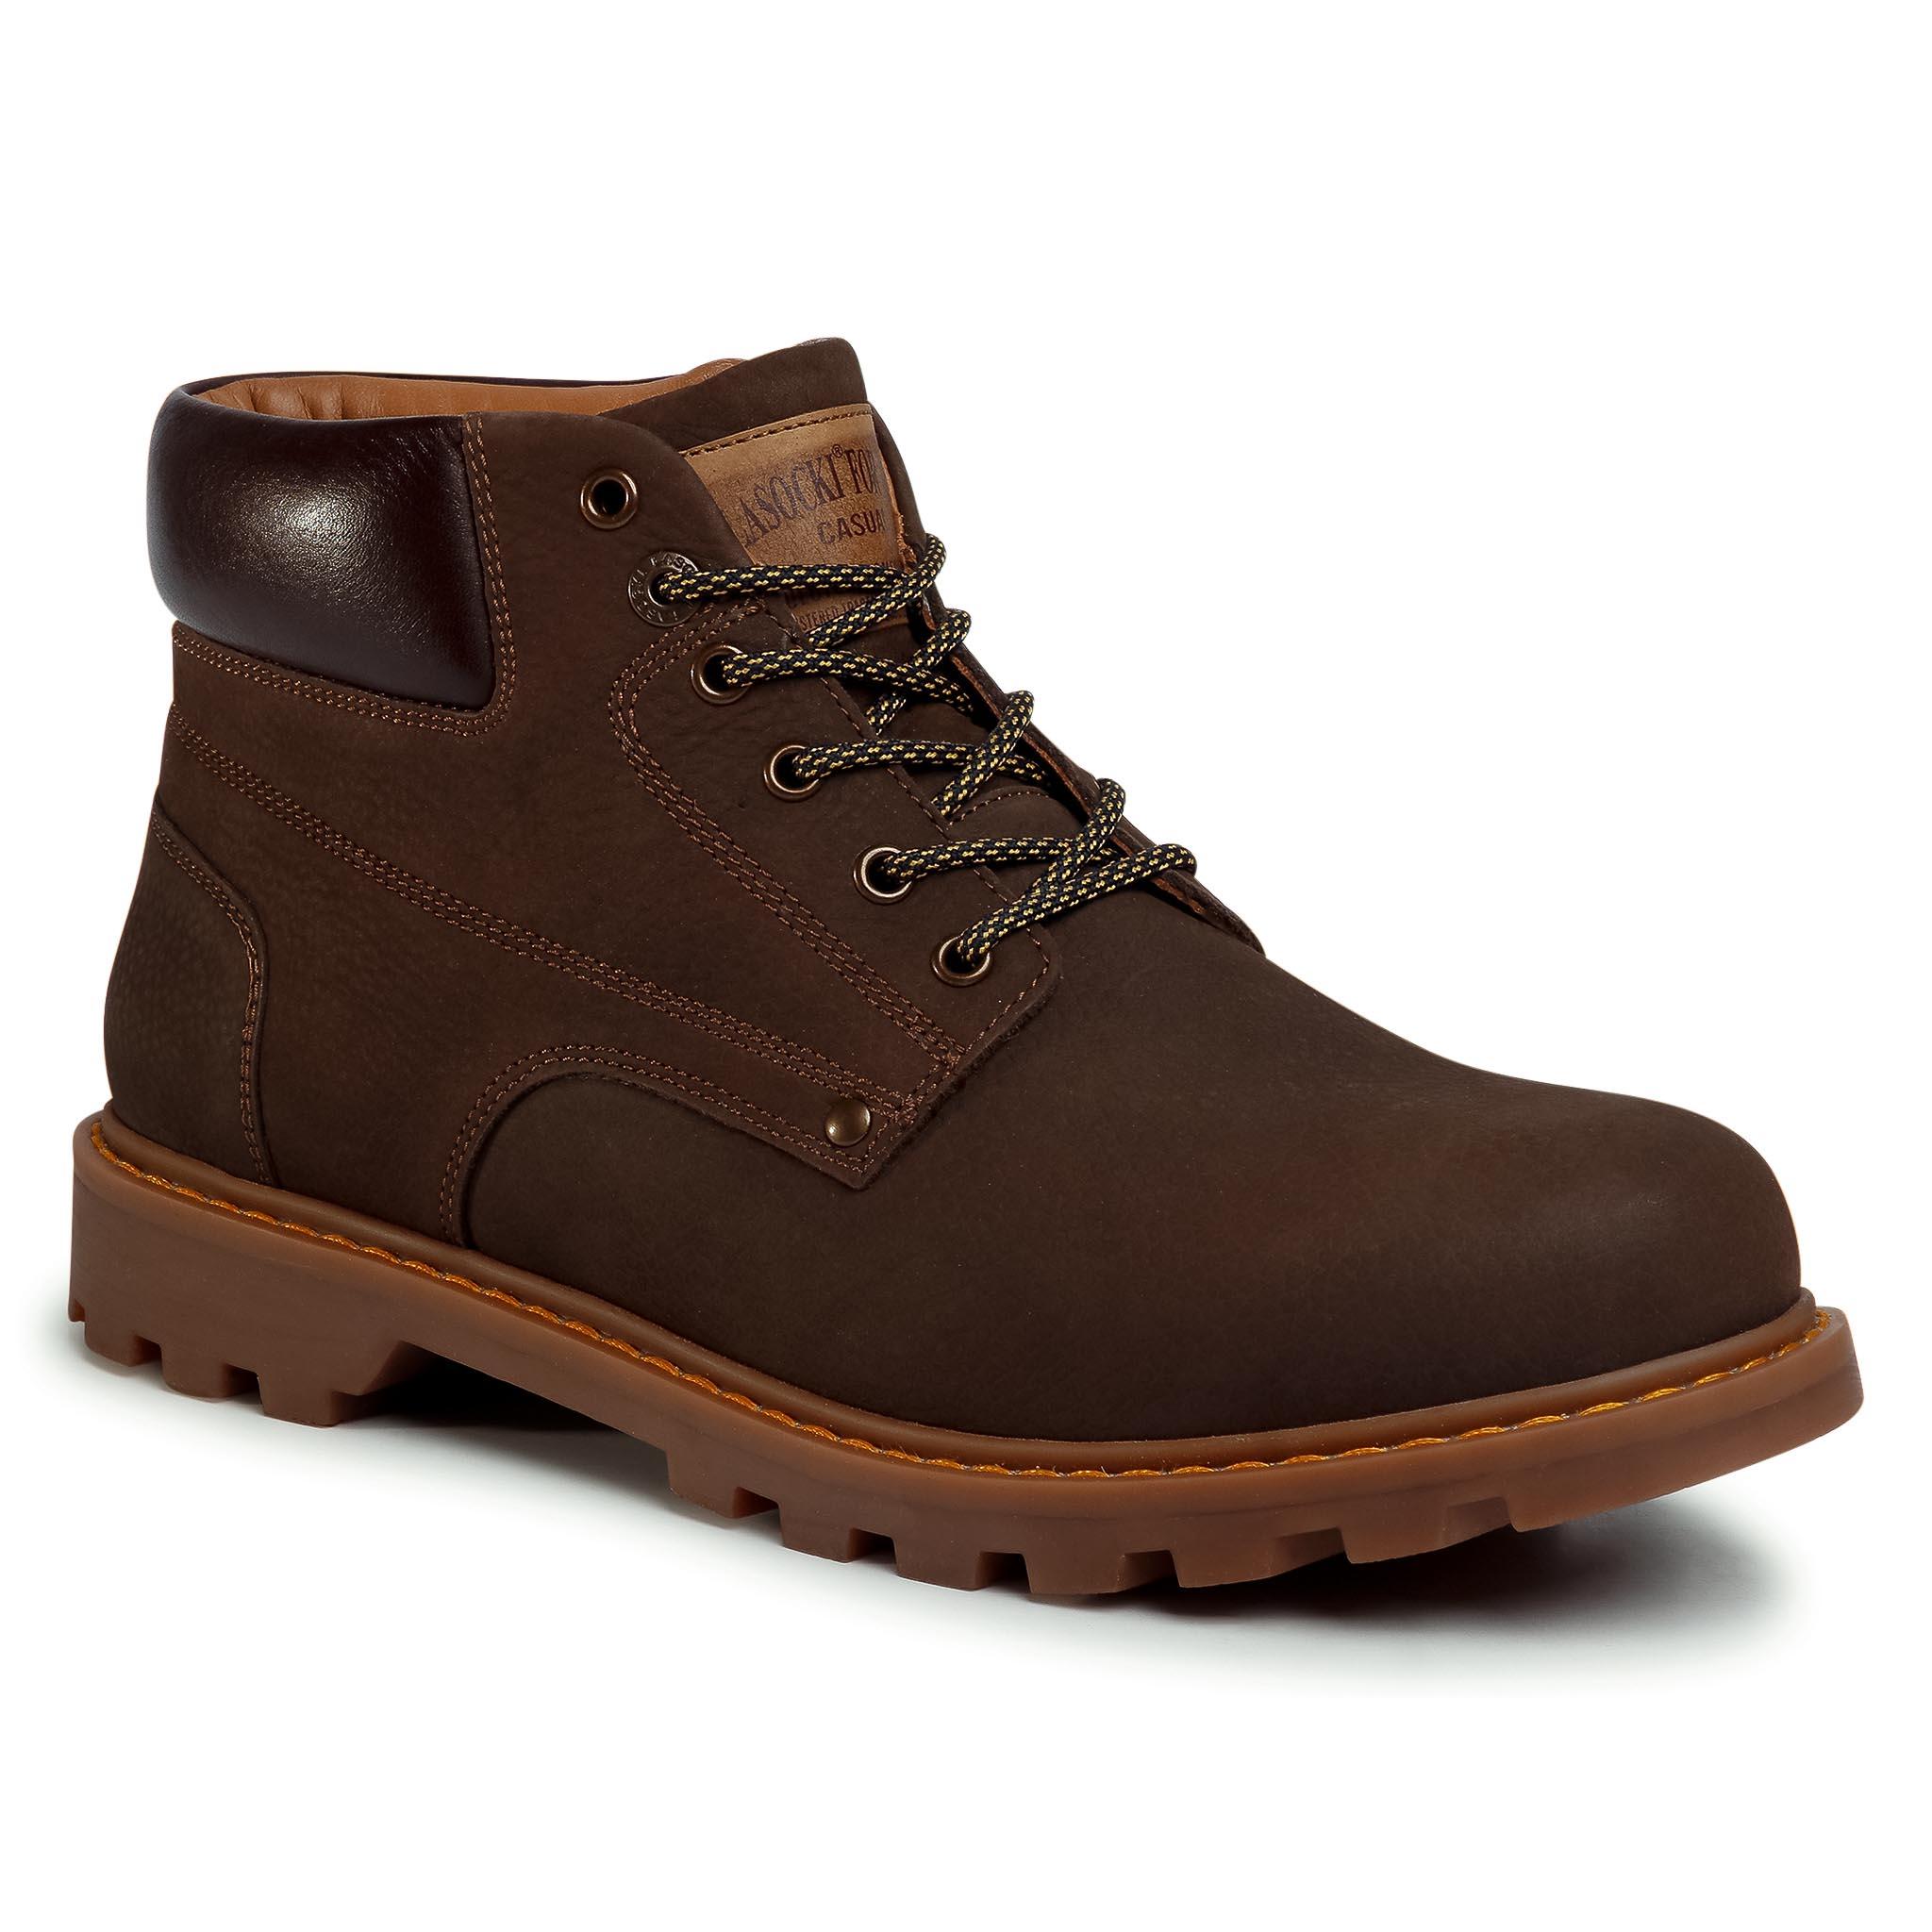 Outdoorová obuv LASOCKI FOR MEN - MI07-A984-A814-03 Brown